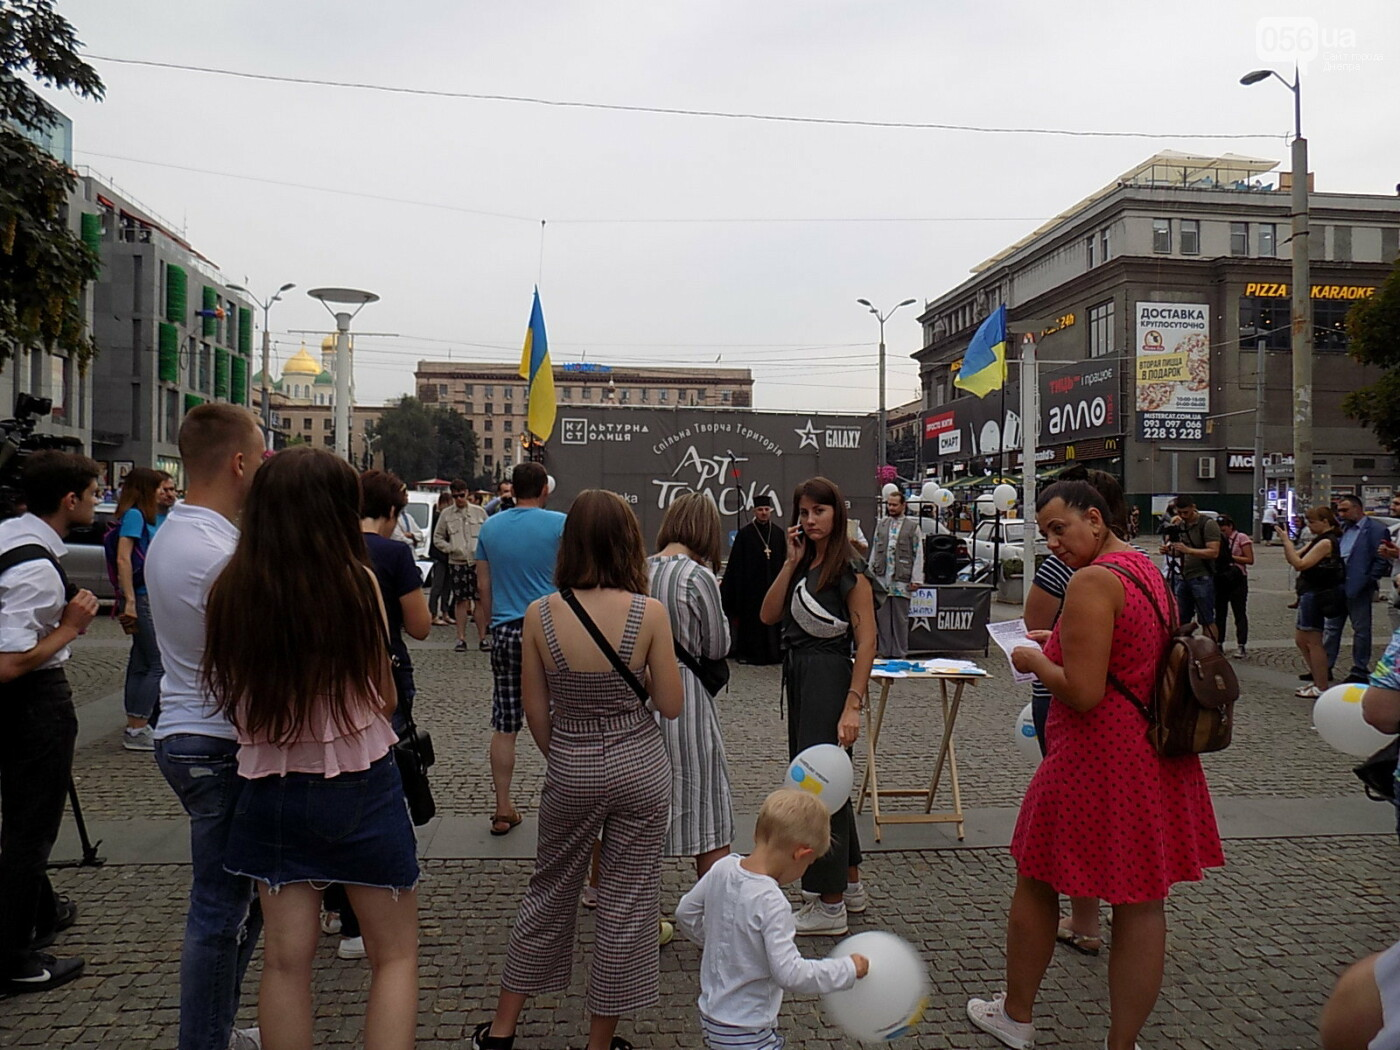 """Мова єднає Дніпро"": в центре города прошла символическая акция с концертом и подарками, - ФОТО, фото-15"